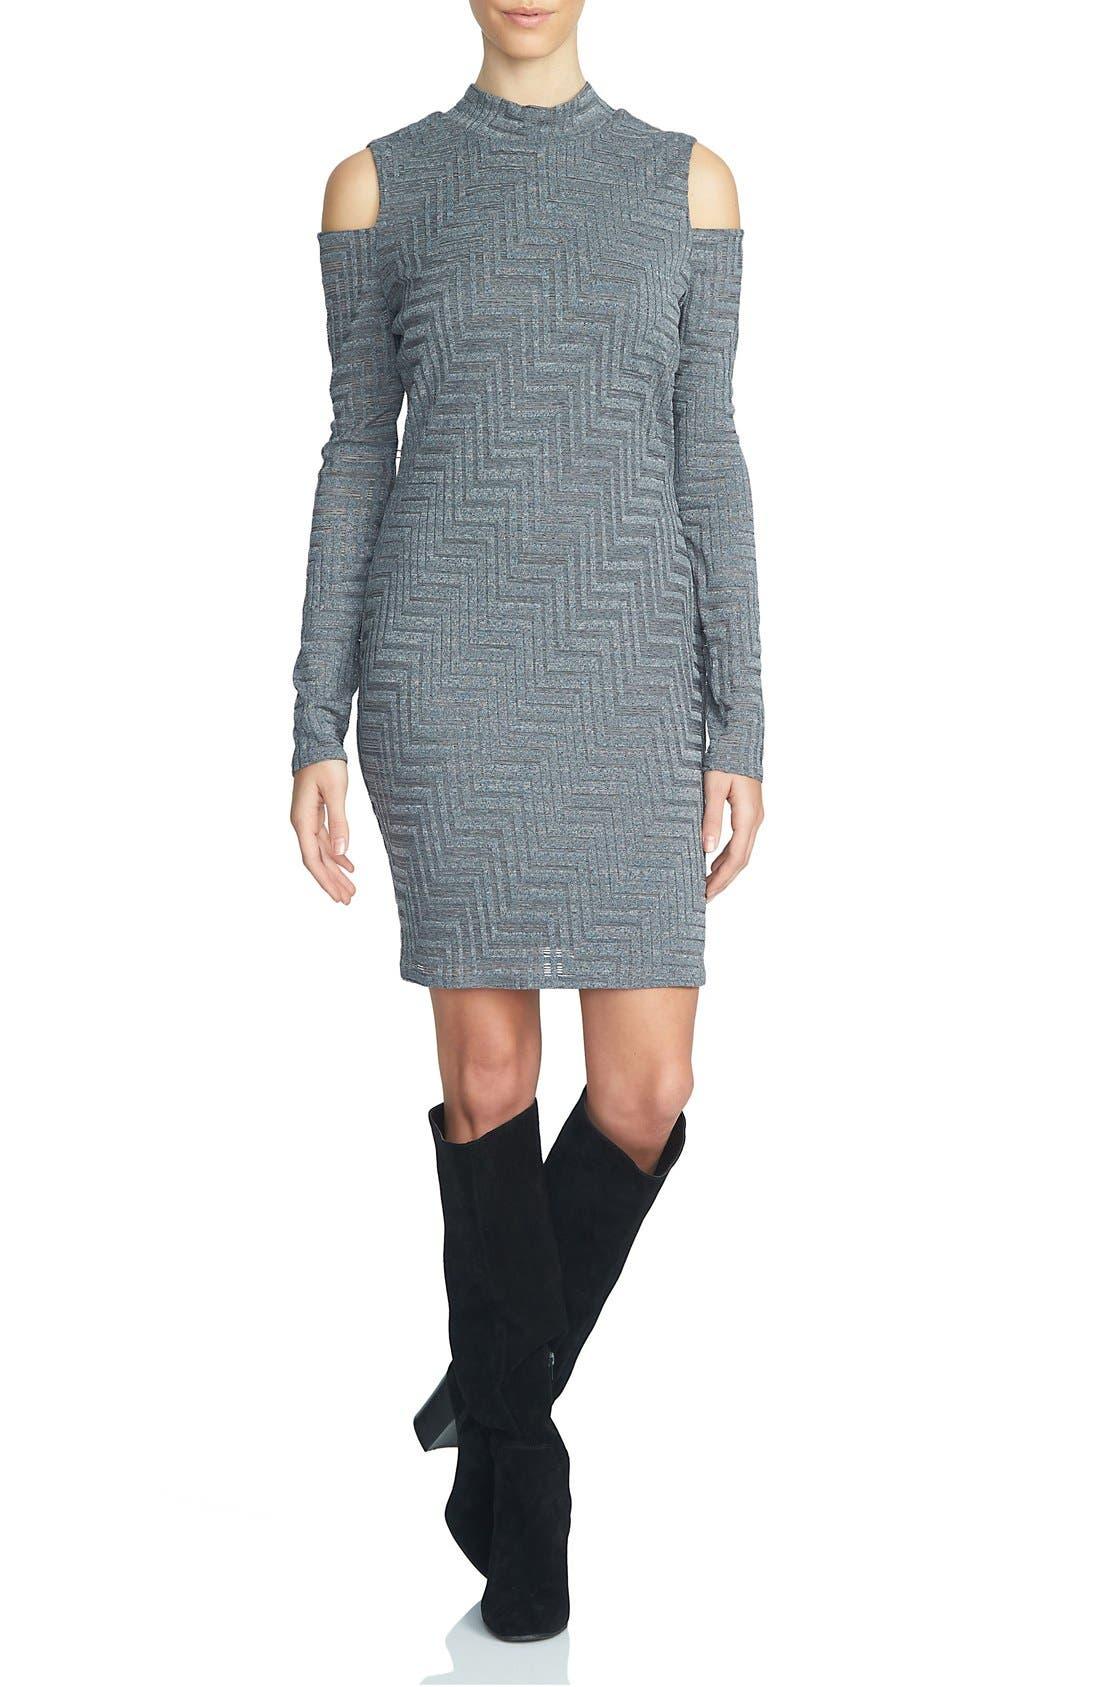 Alternate Image 1 Selected - 1.STATE Cold Shoulder Sweater Dress